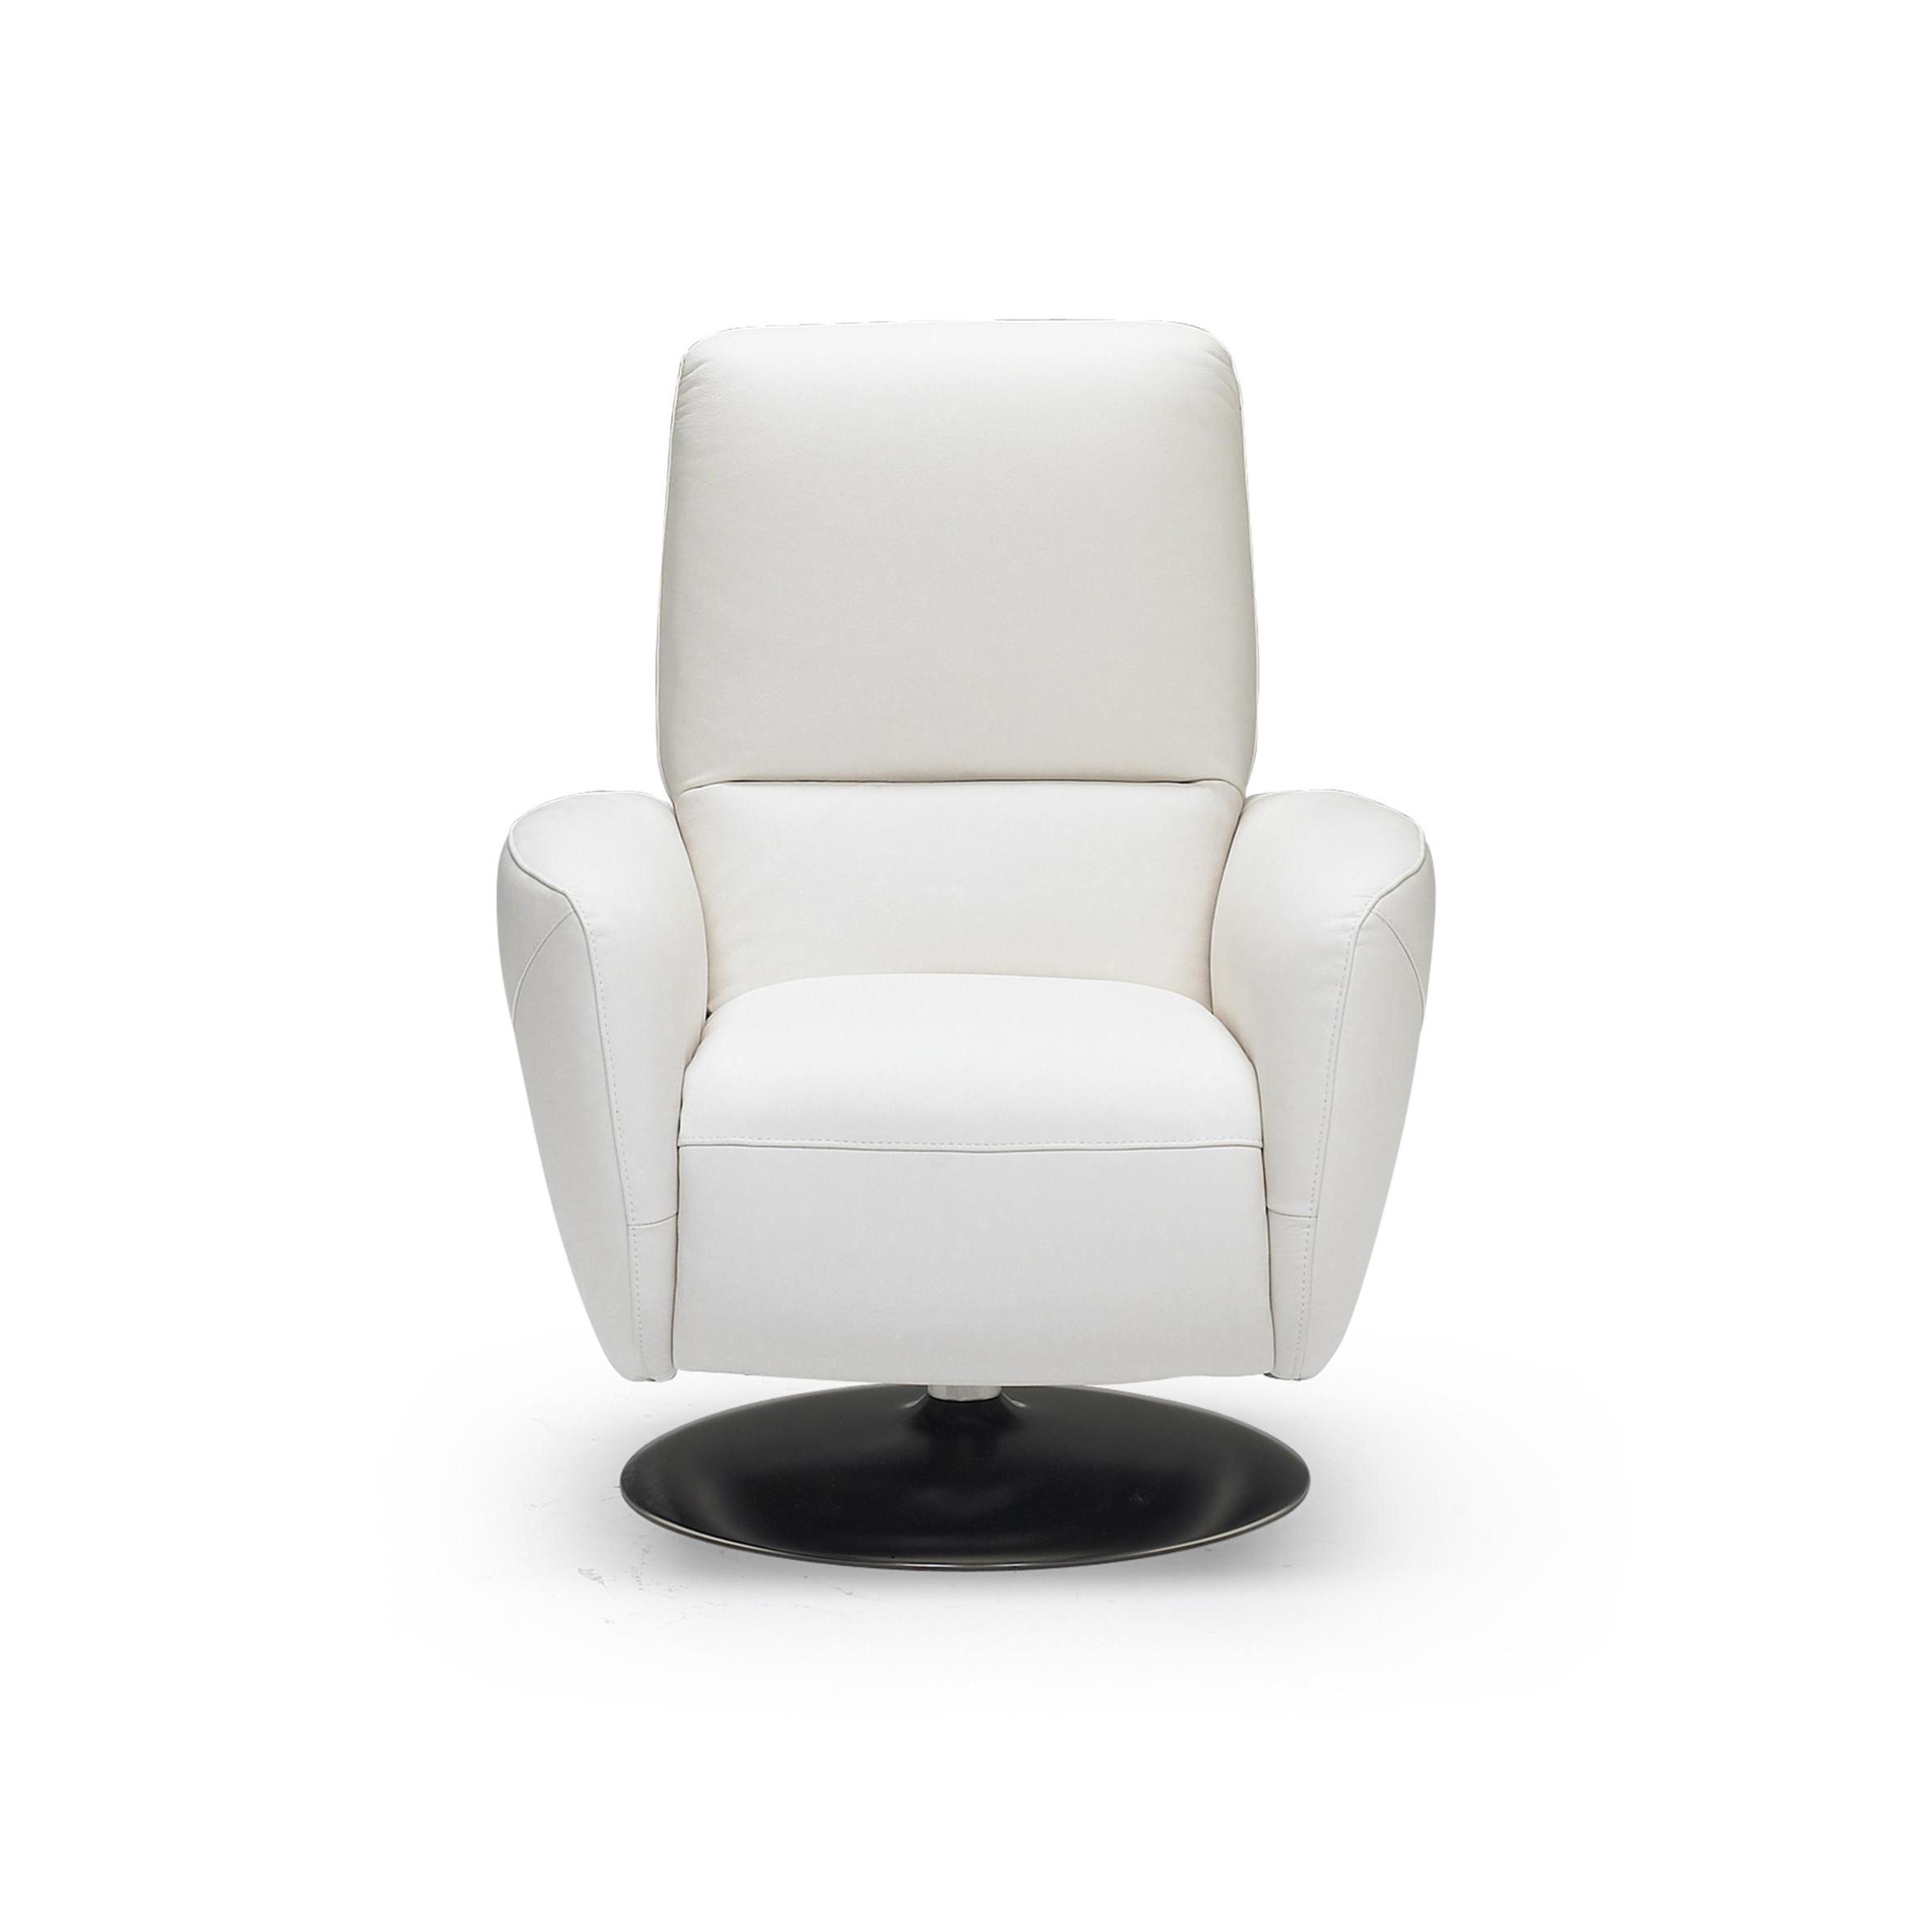 swivel chair the range folding adirondack rocking plans natuzzi italia genny reclining